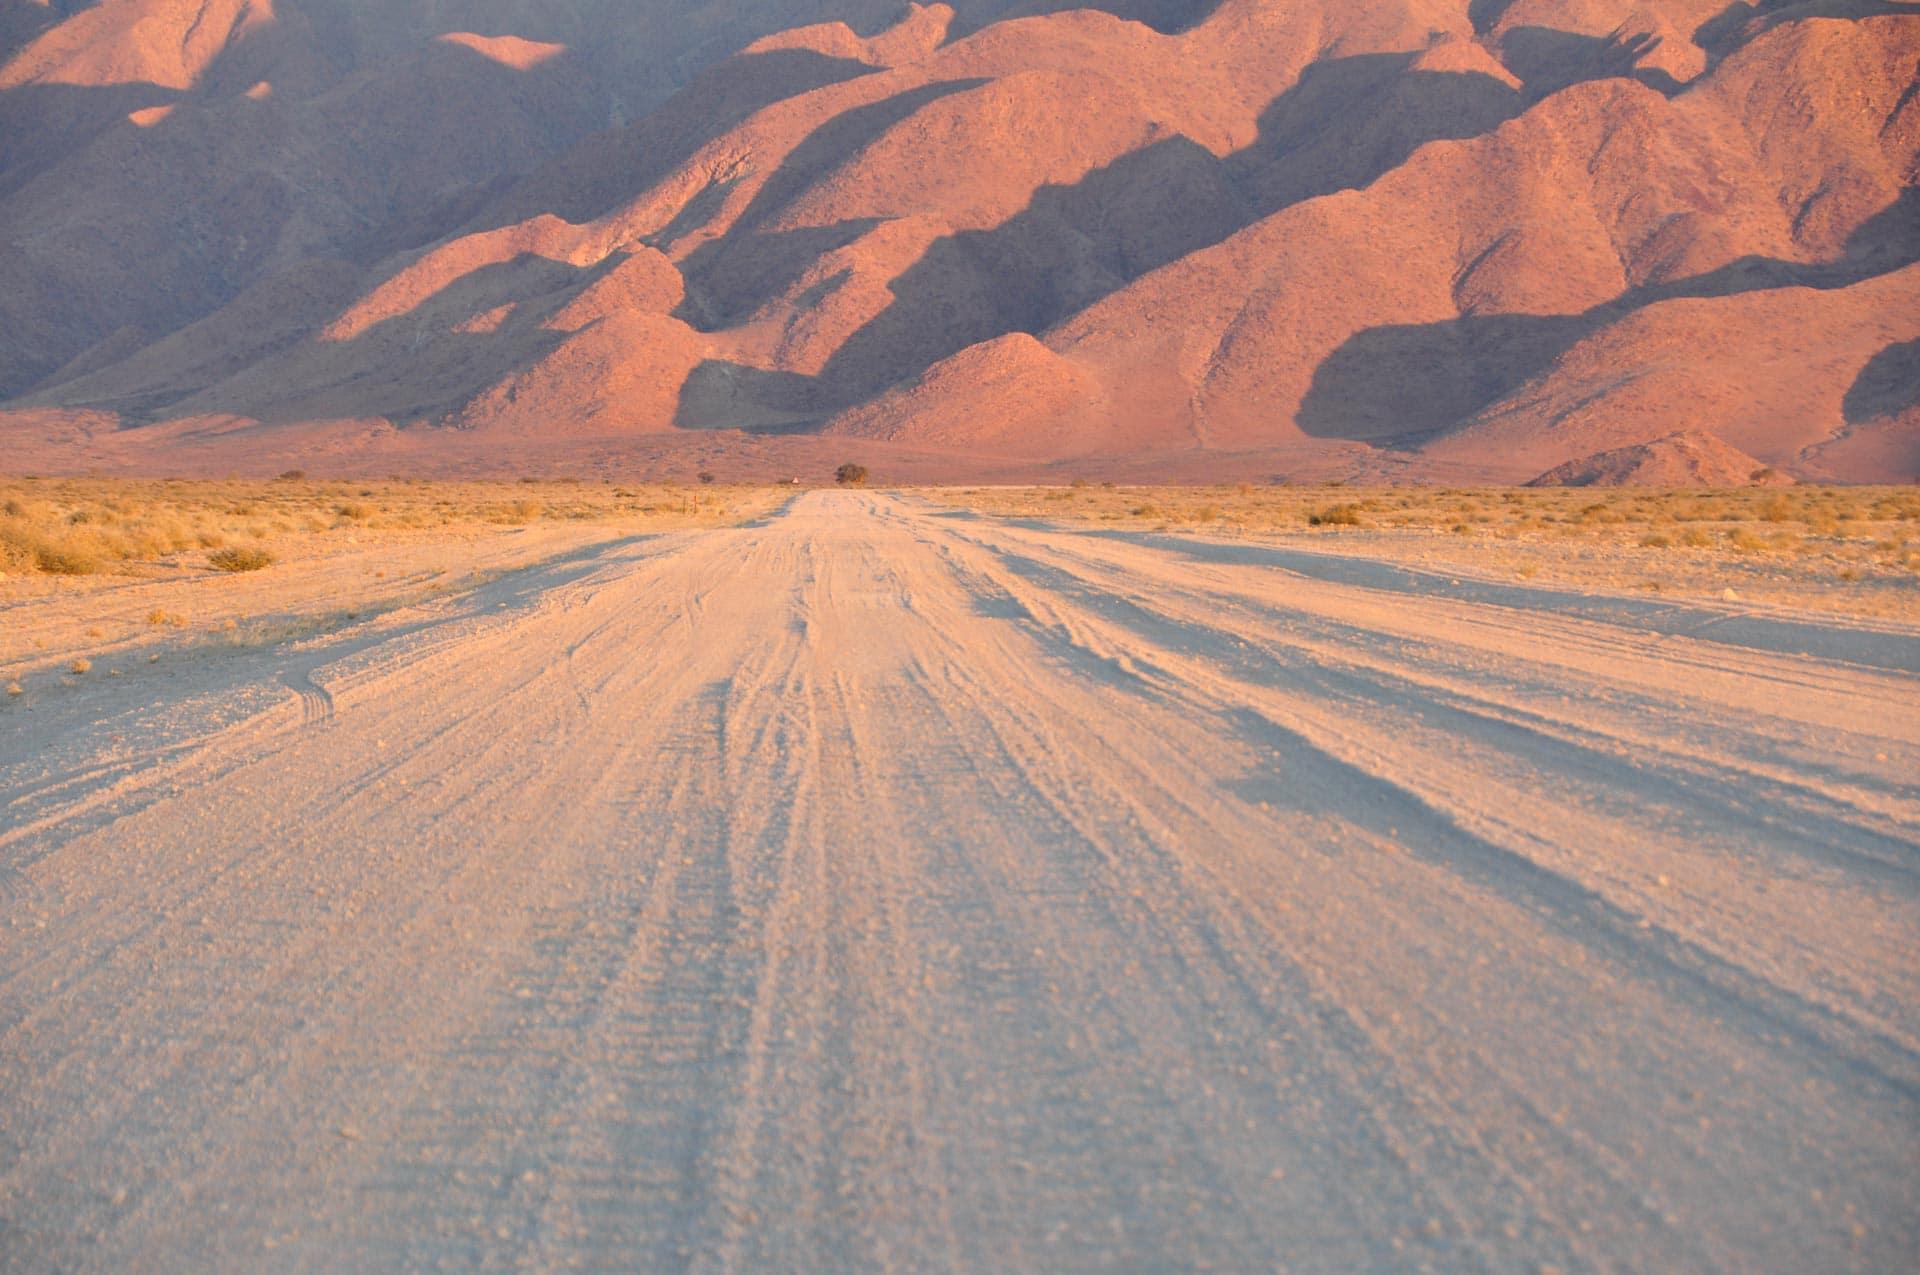 Sossuvlei-Wueste-Namib-Namibia-Globetrotter-Select-7